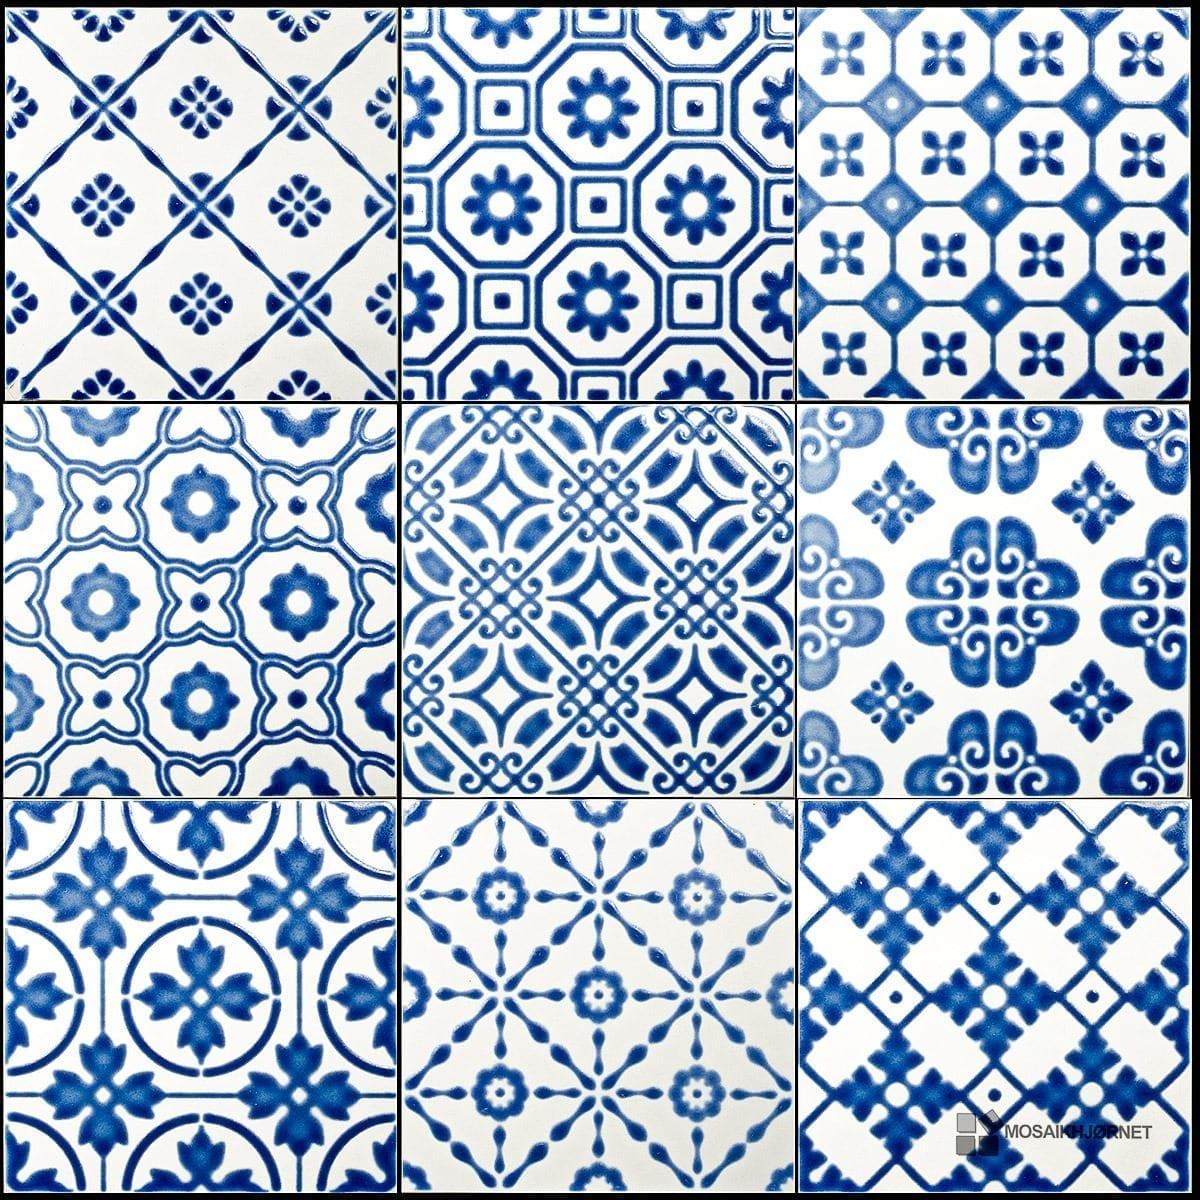 #063385 Mest effektive 20x20 Bon Ton Blå På Hvid Mosaikhjørnet Fliser Klinker Og Mosaik Til Bad  Fliser Til Bad Og Køkken 4805 120012004805